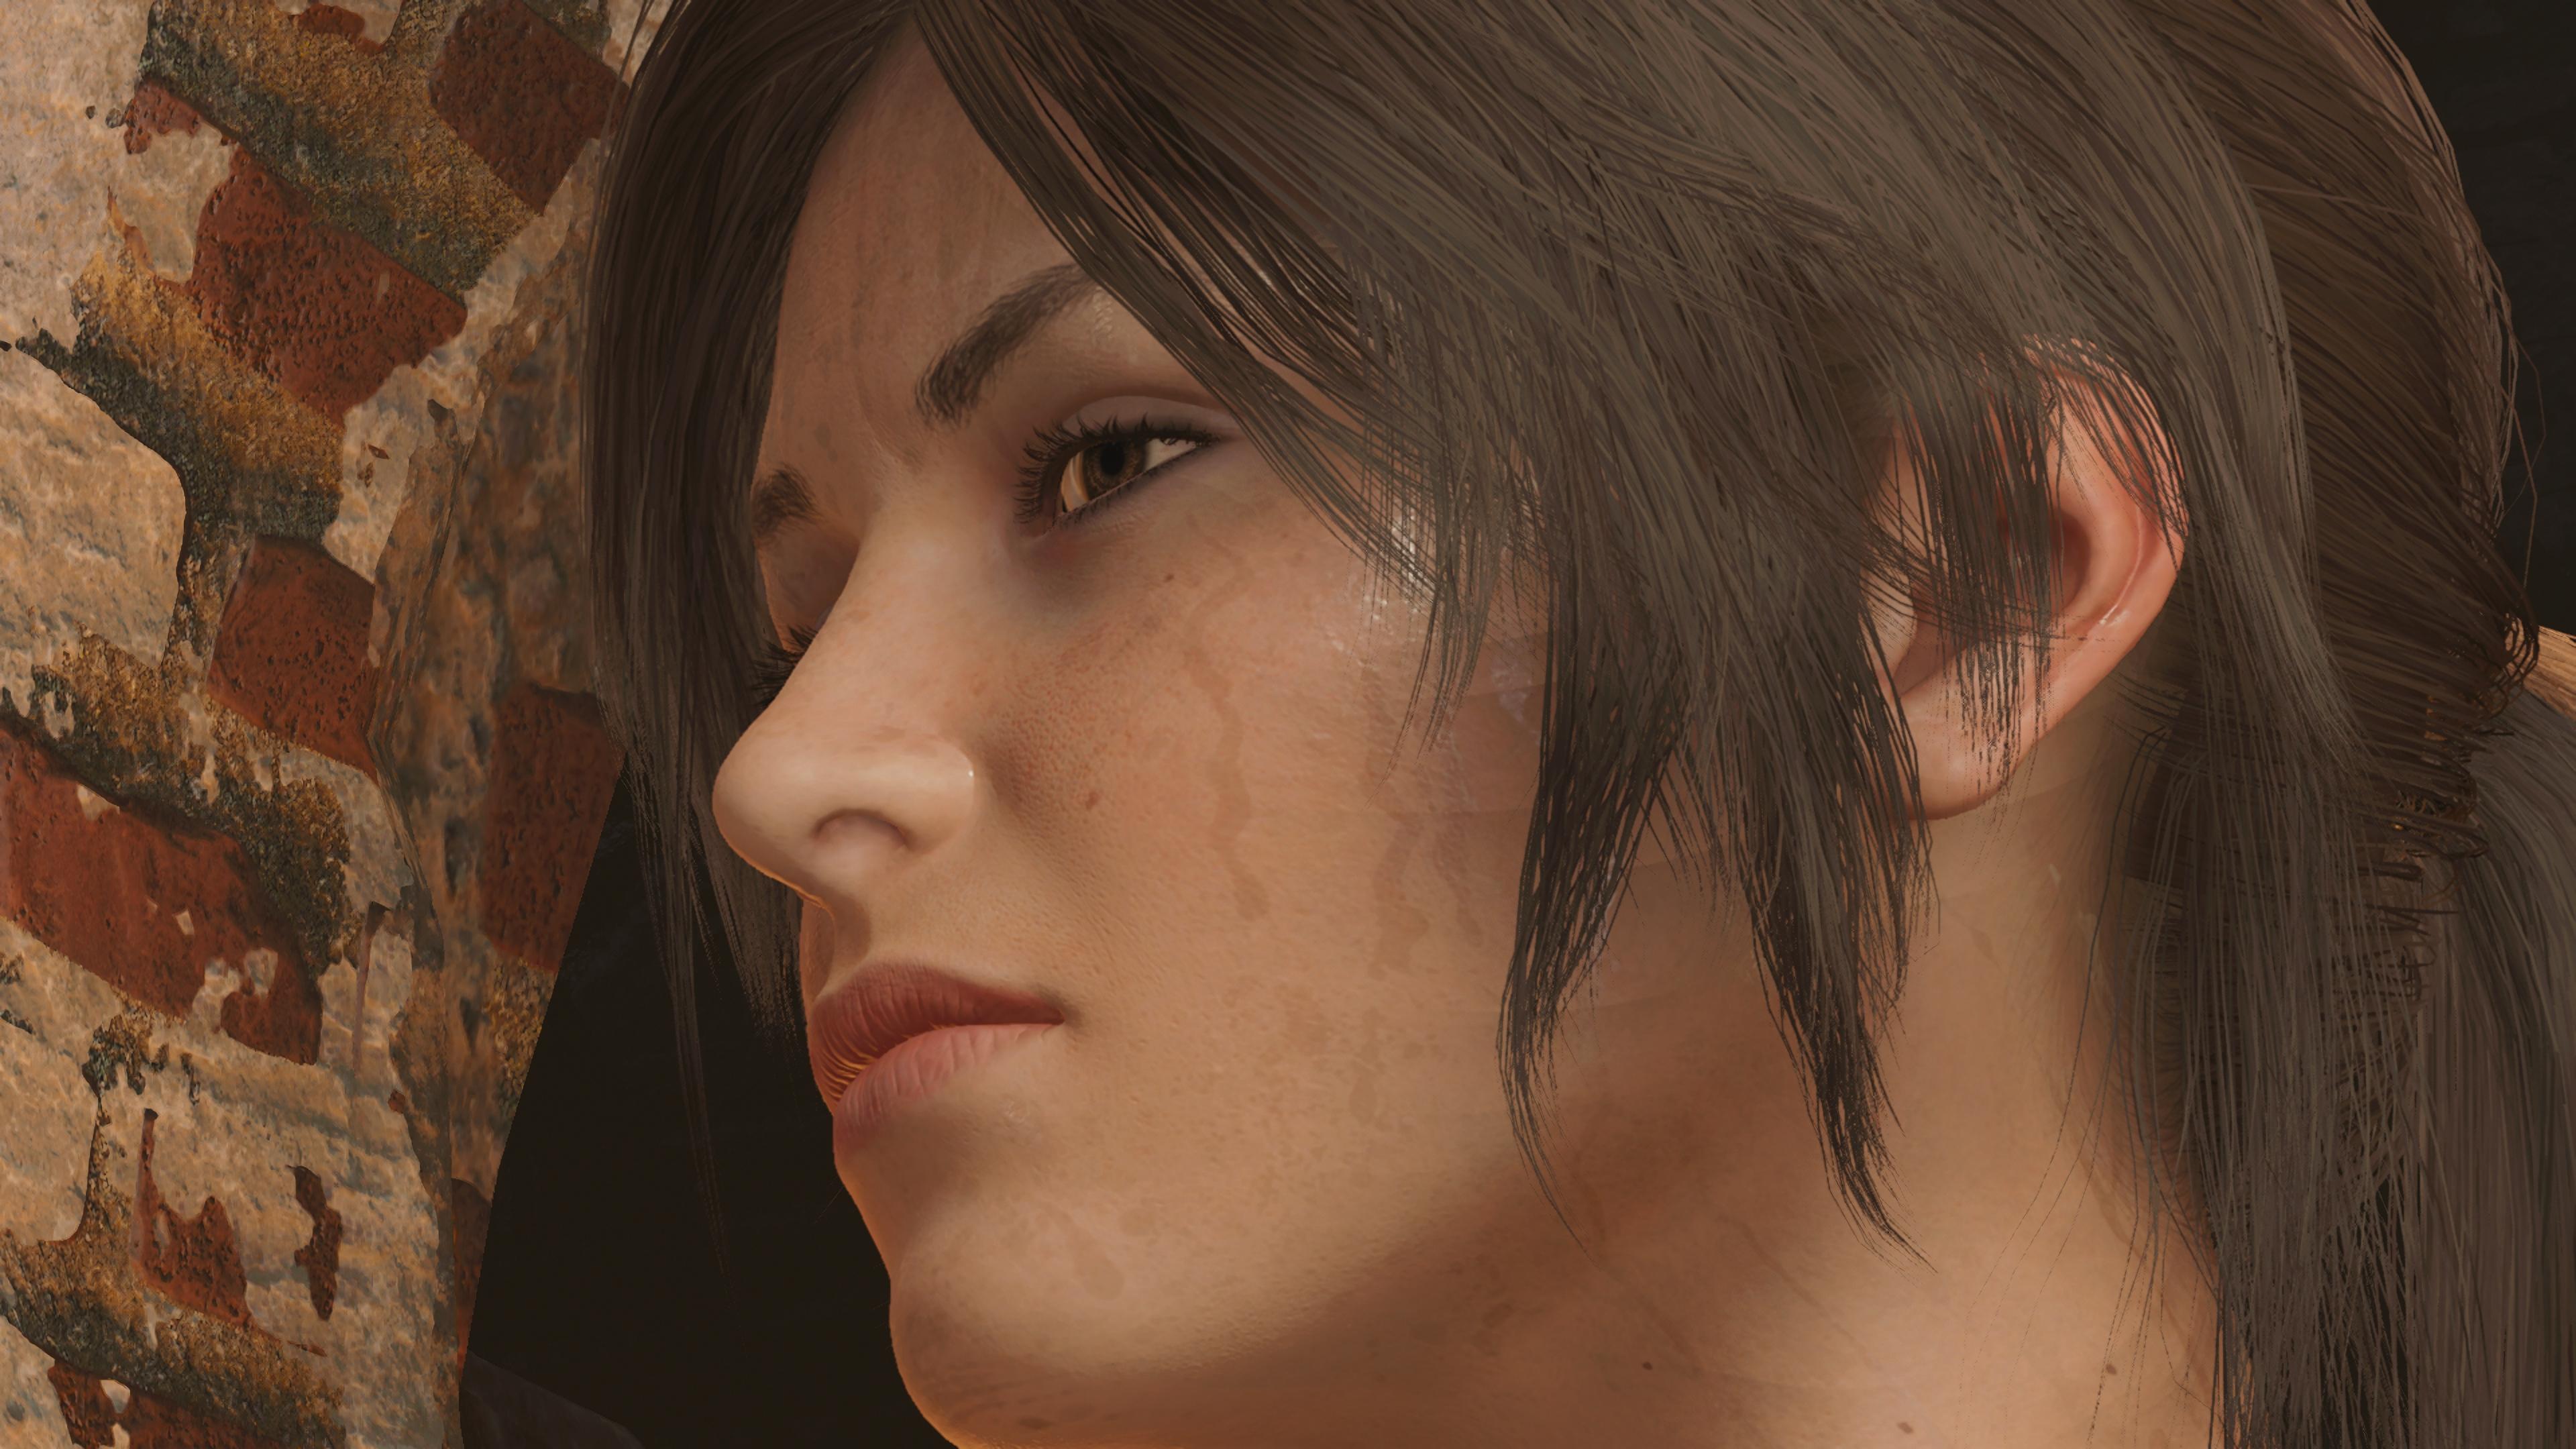 Shadow of the Tomb Raider скриншот с GeForce RTX 2080 - Shadow of the Tomb Raider Лара Крофт